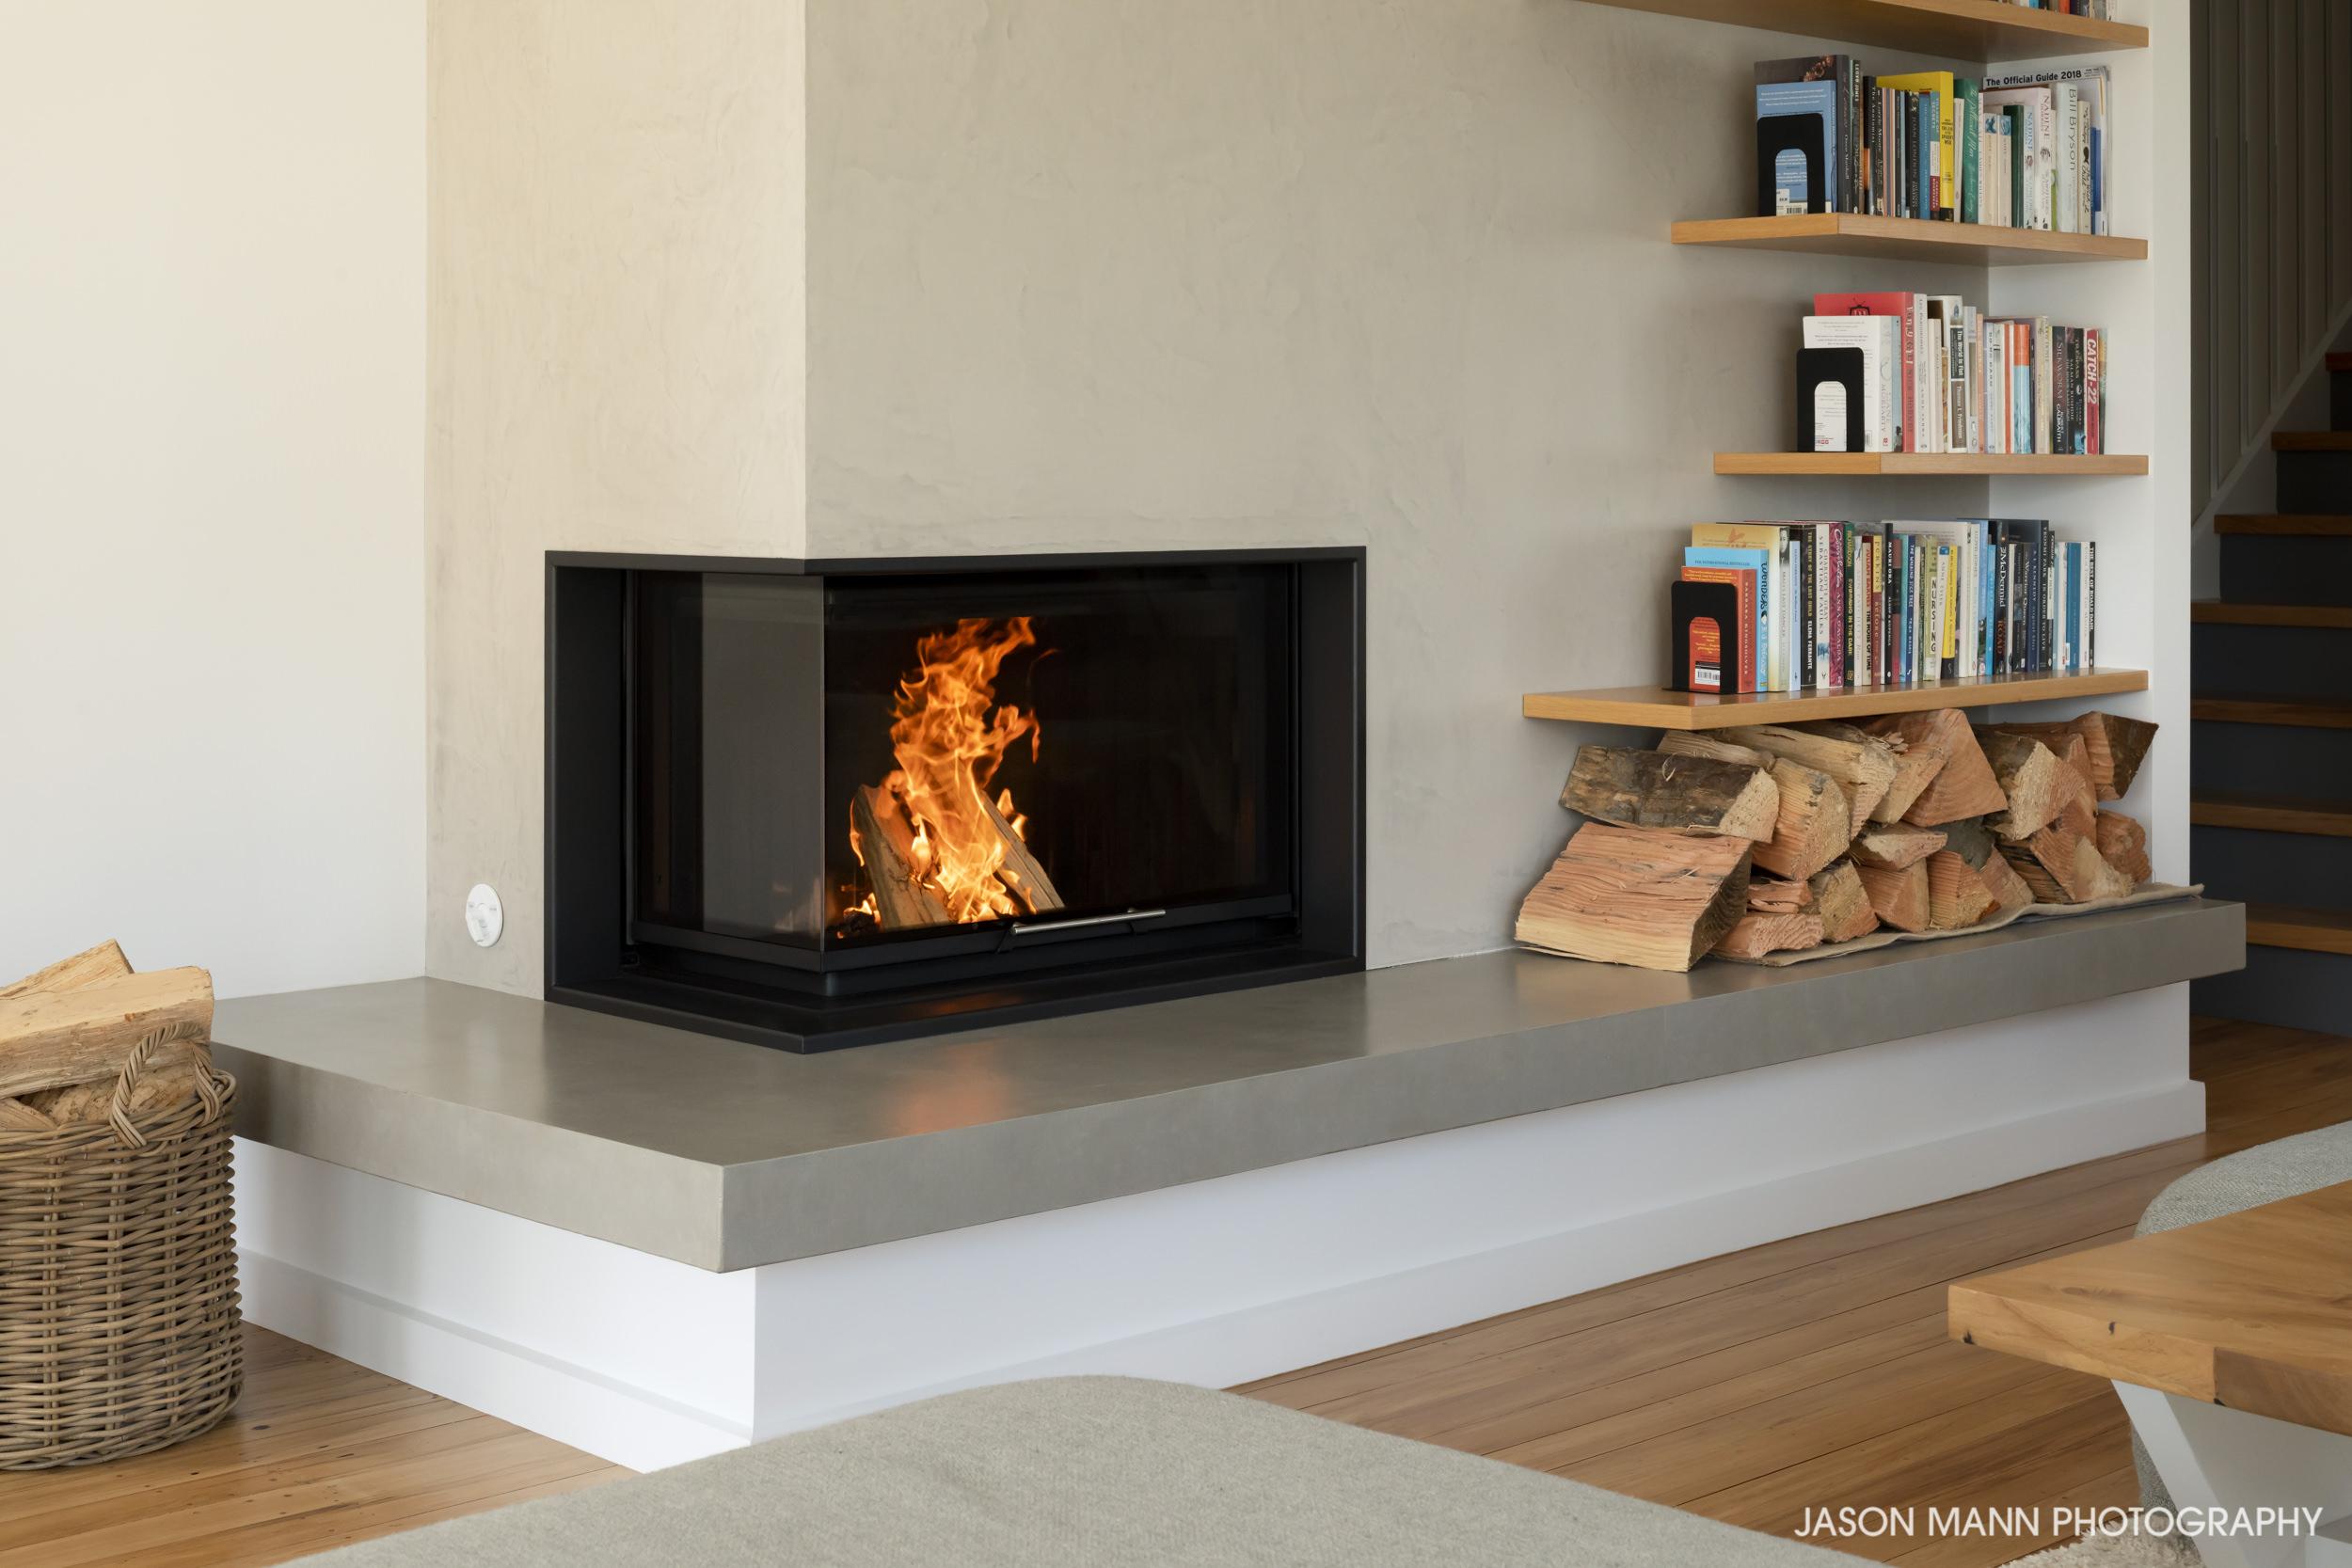 Jason_Mann_Fireplaces_03.jpg